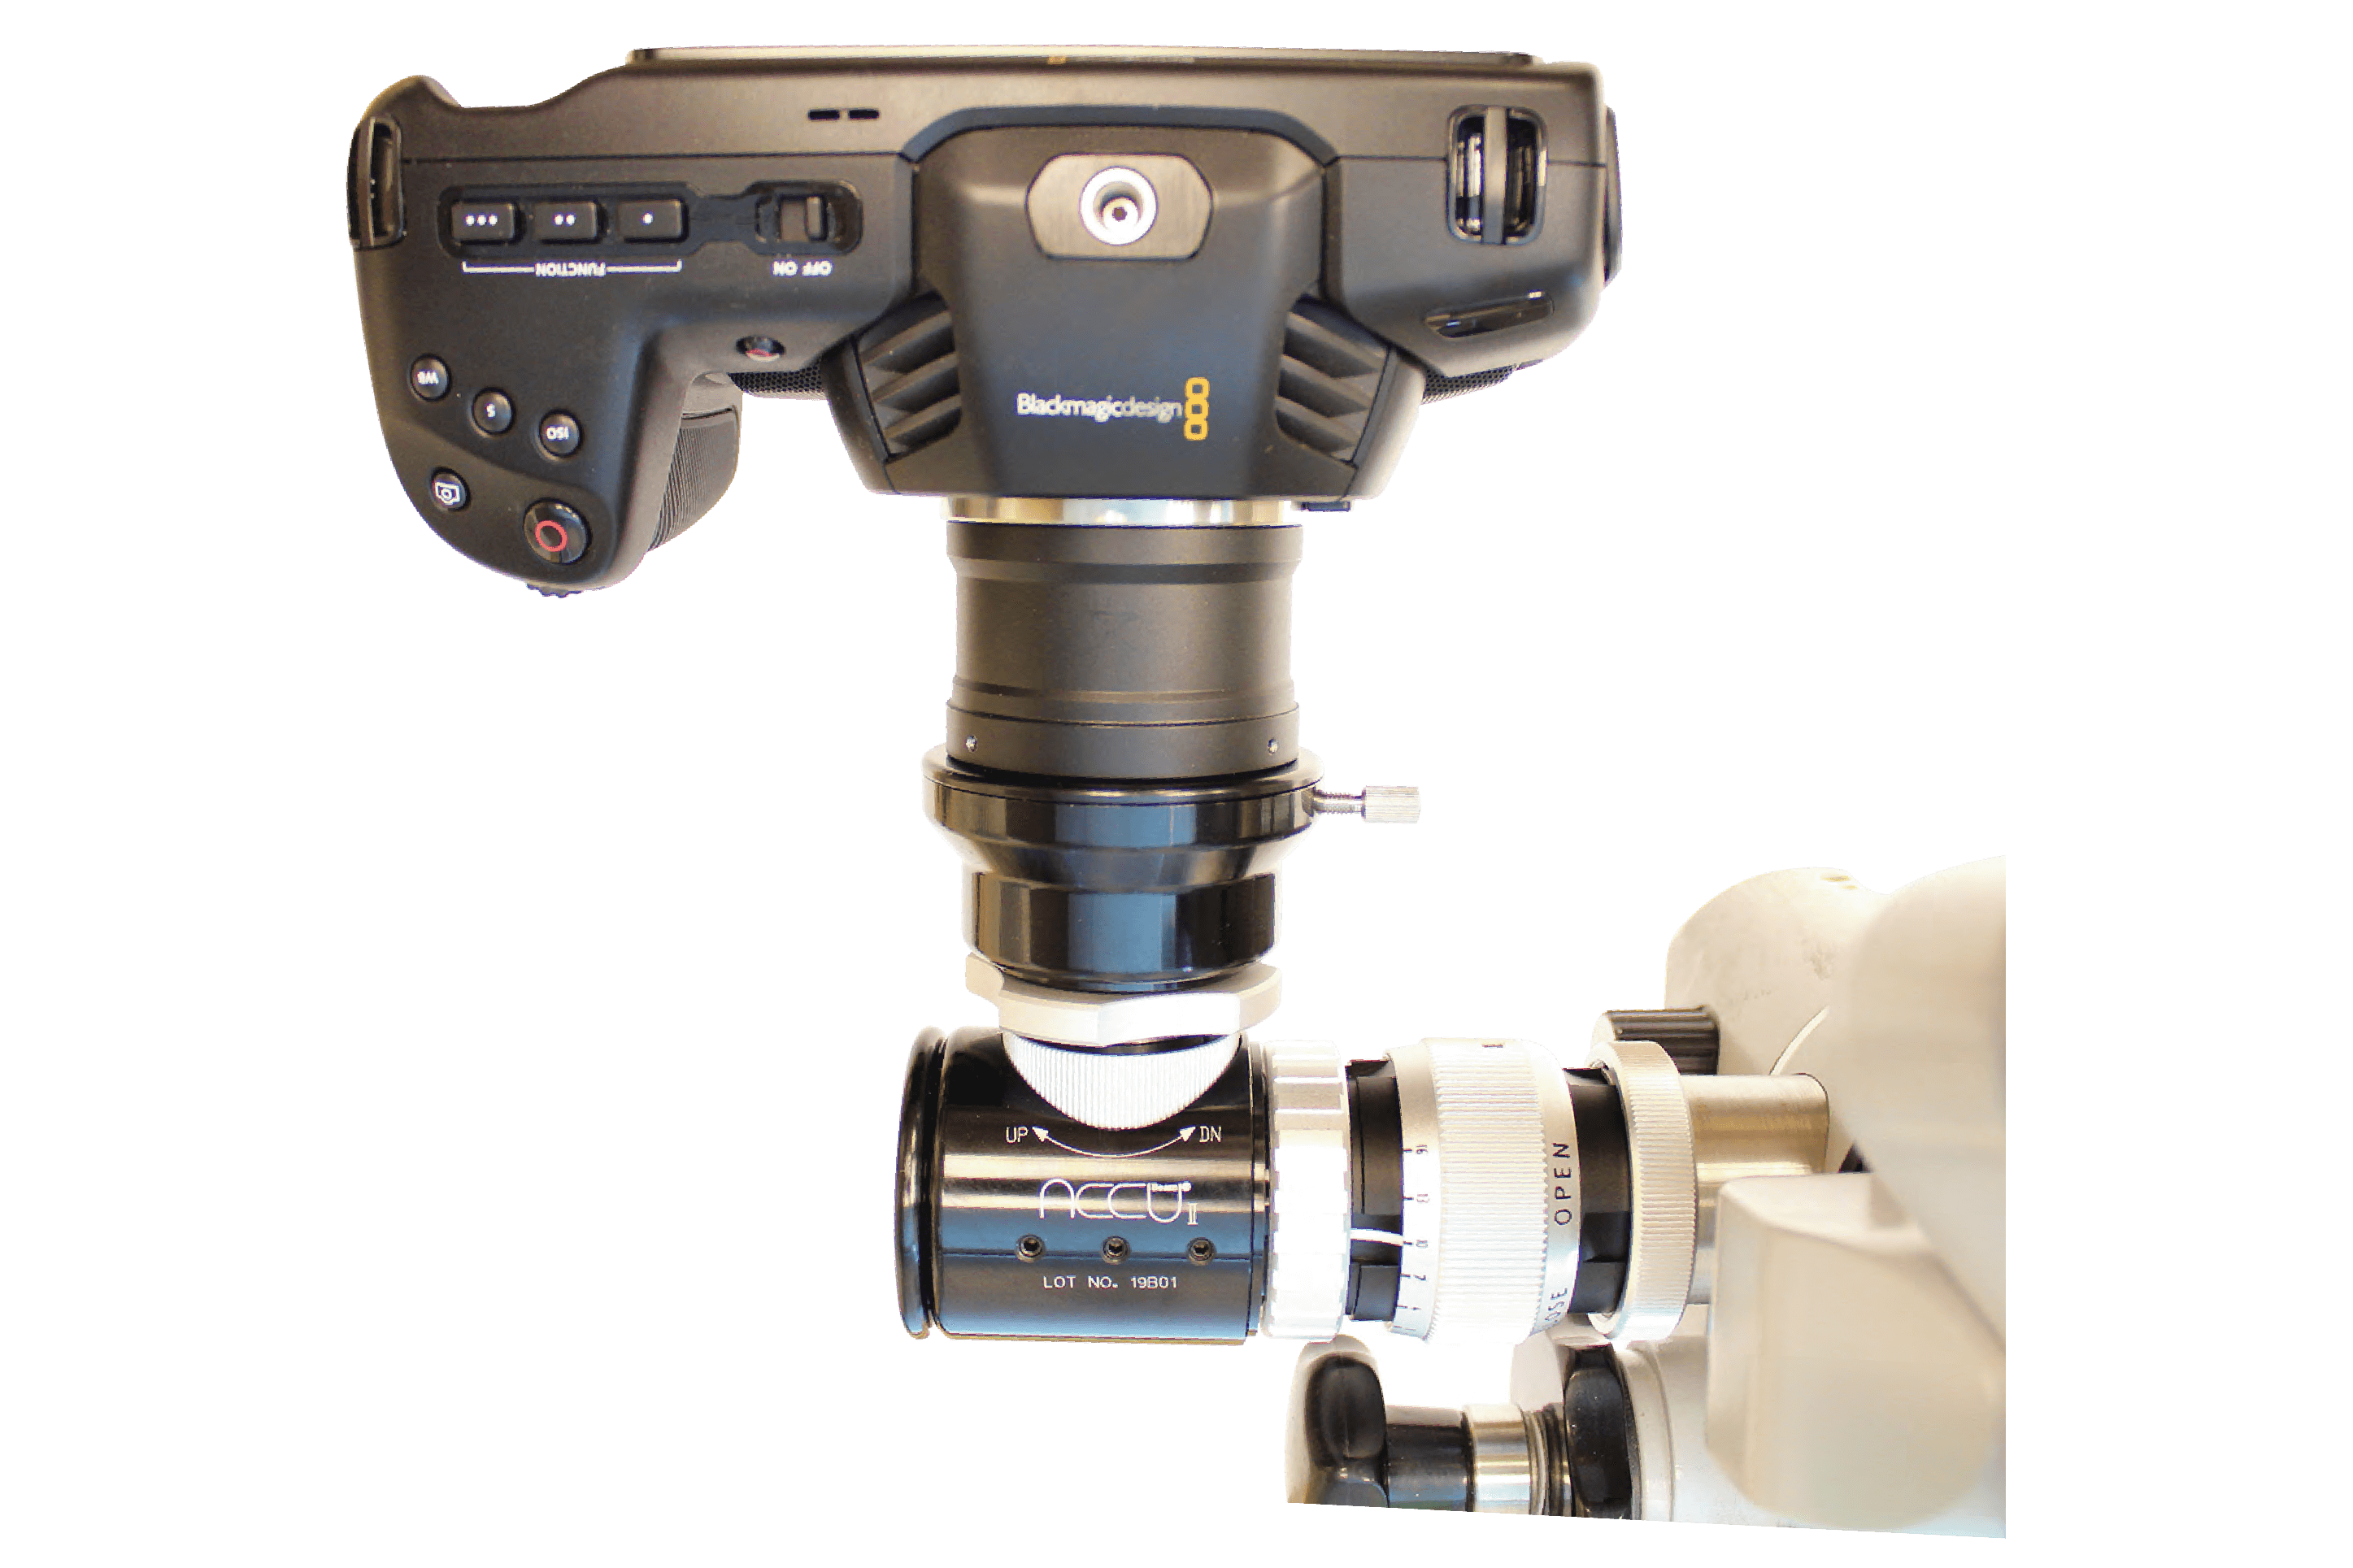 Blackmagic SLR Adapter